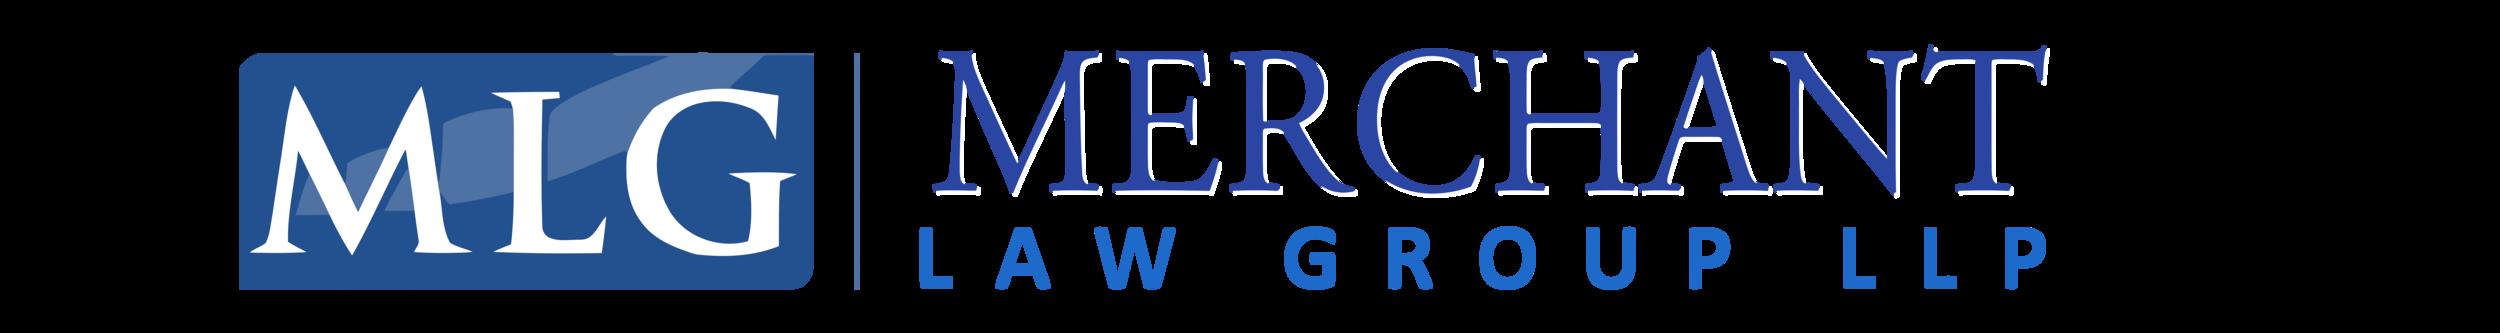 Merchant Law Group logo.png